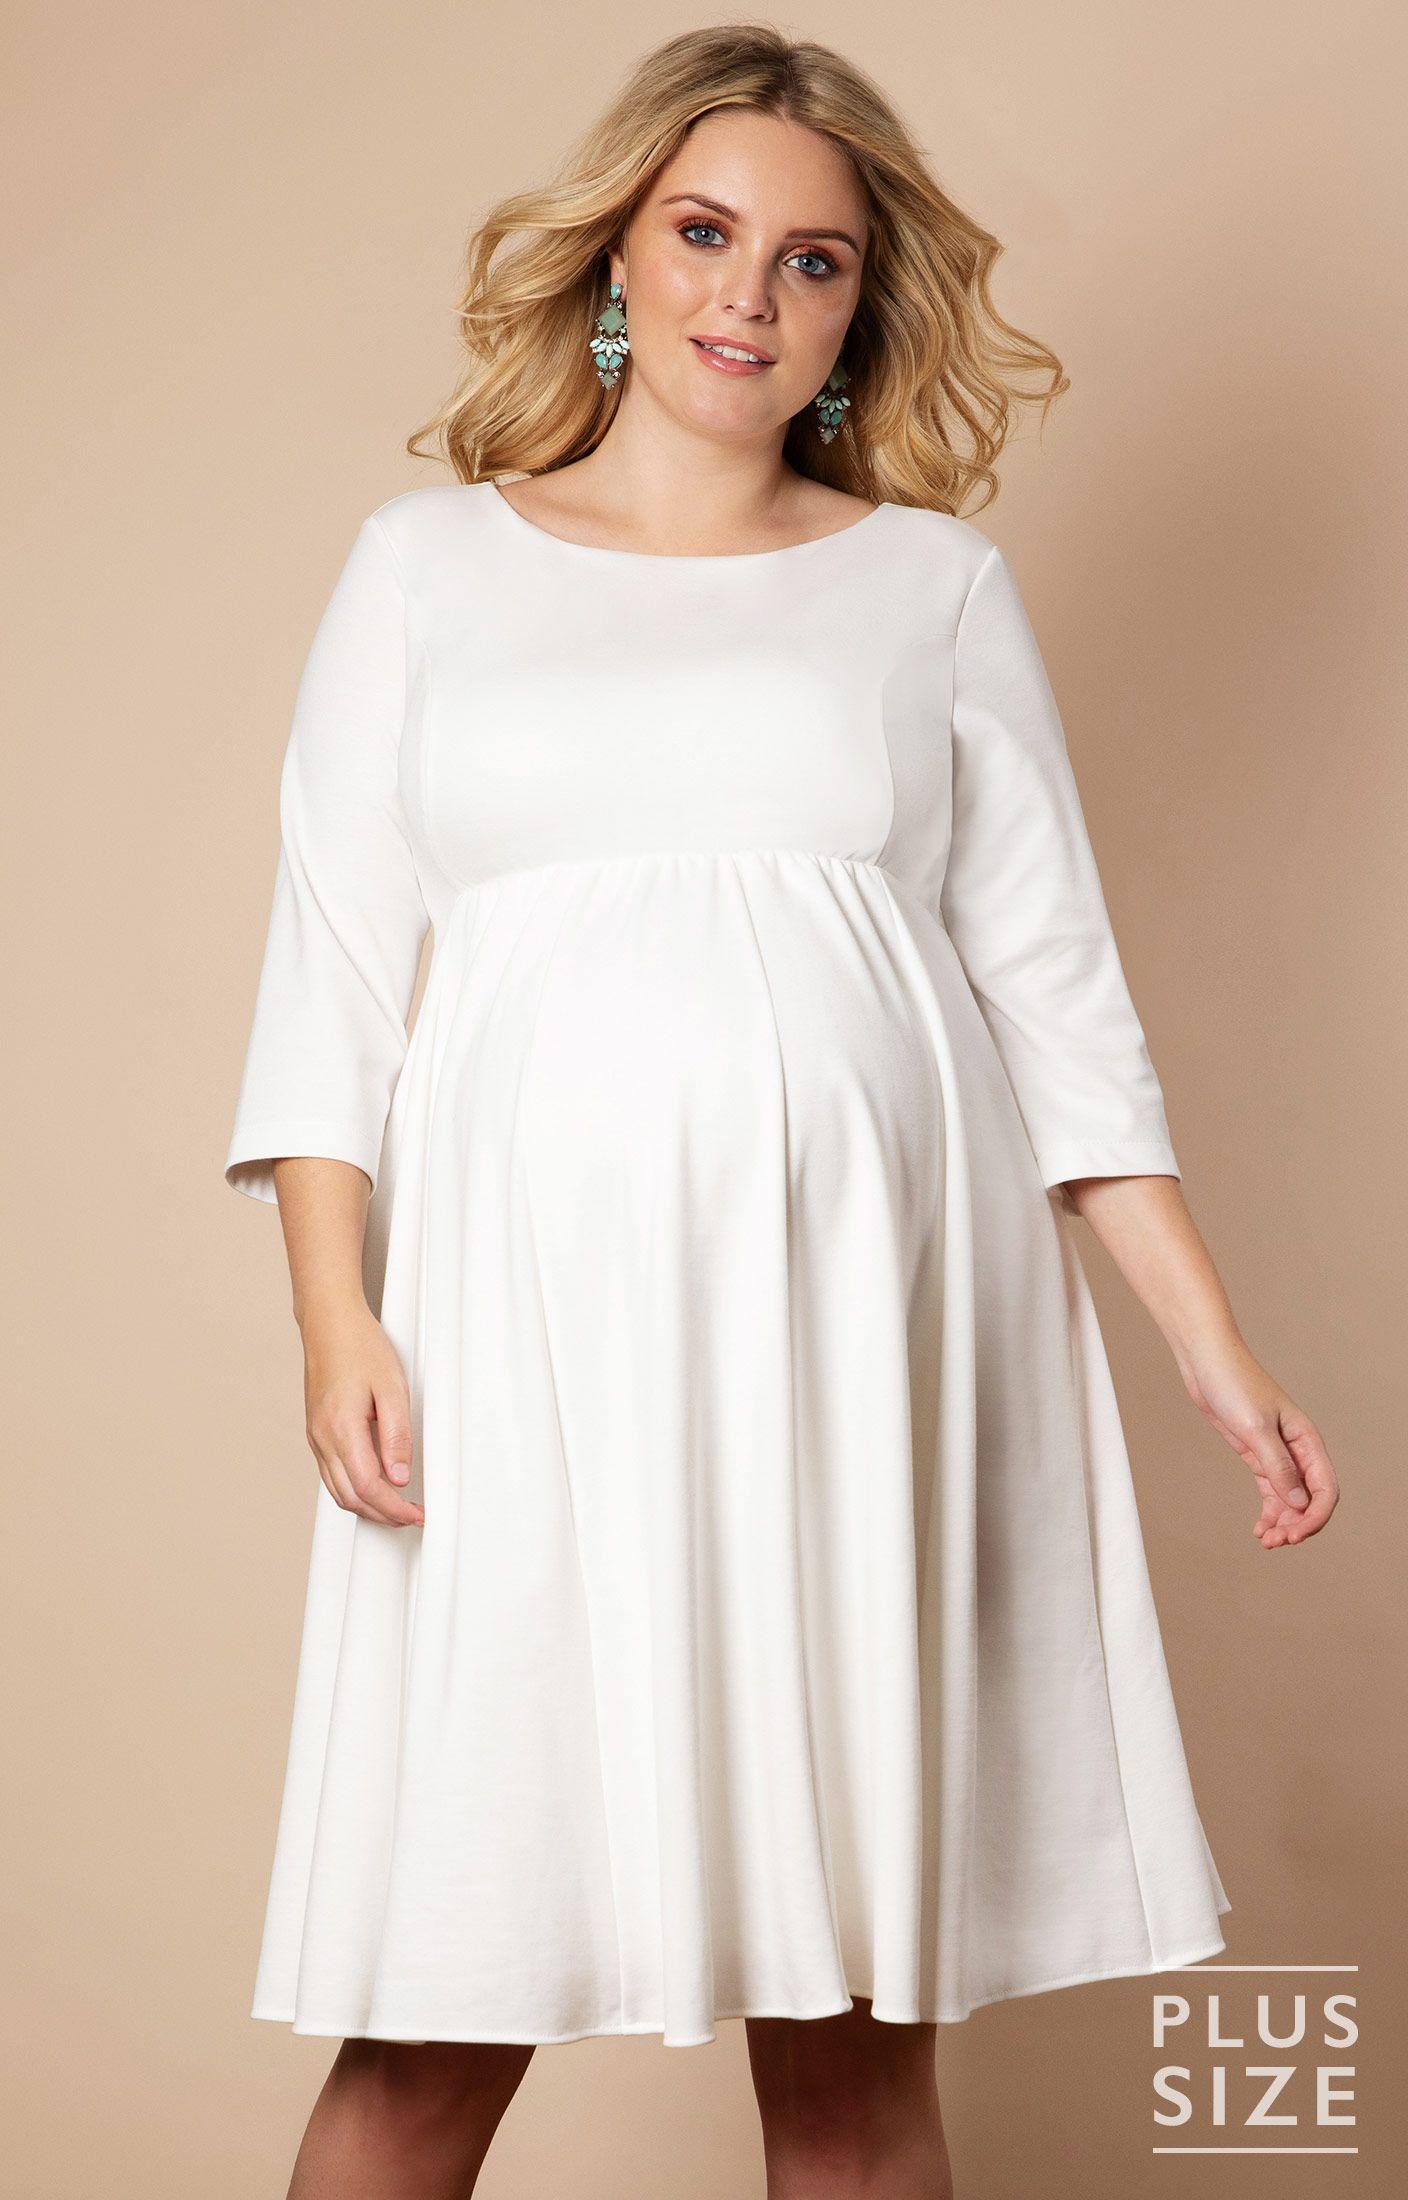 47+ Plus size maternity wedding dresses uk info